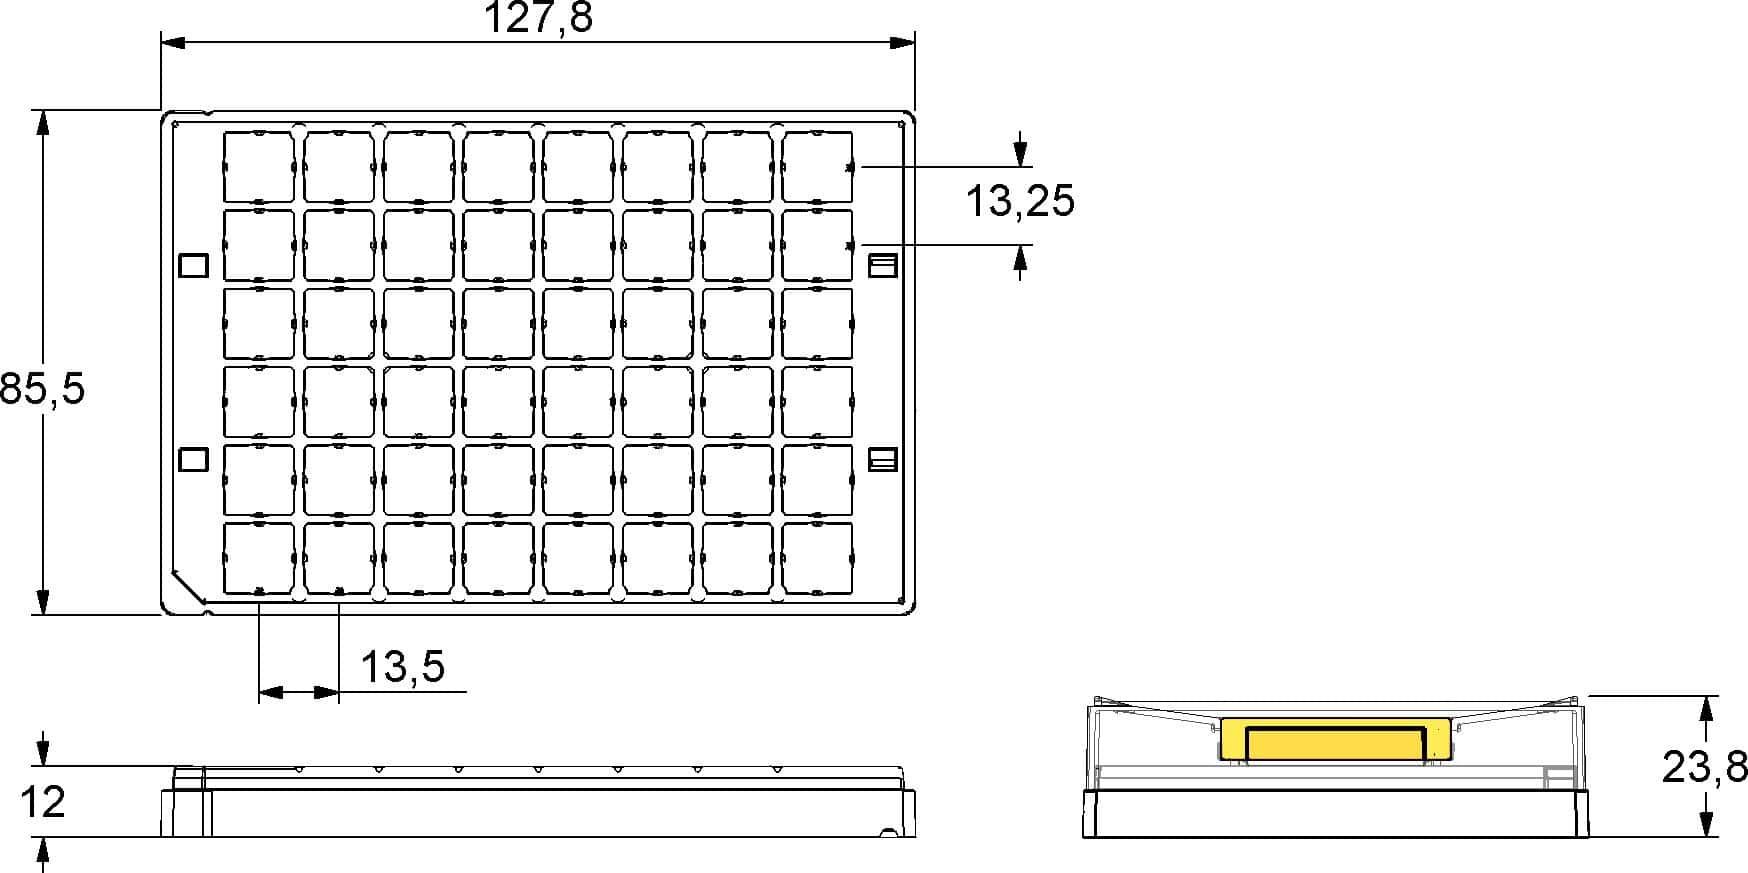 Micronic 48-1 Rack dimensions